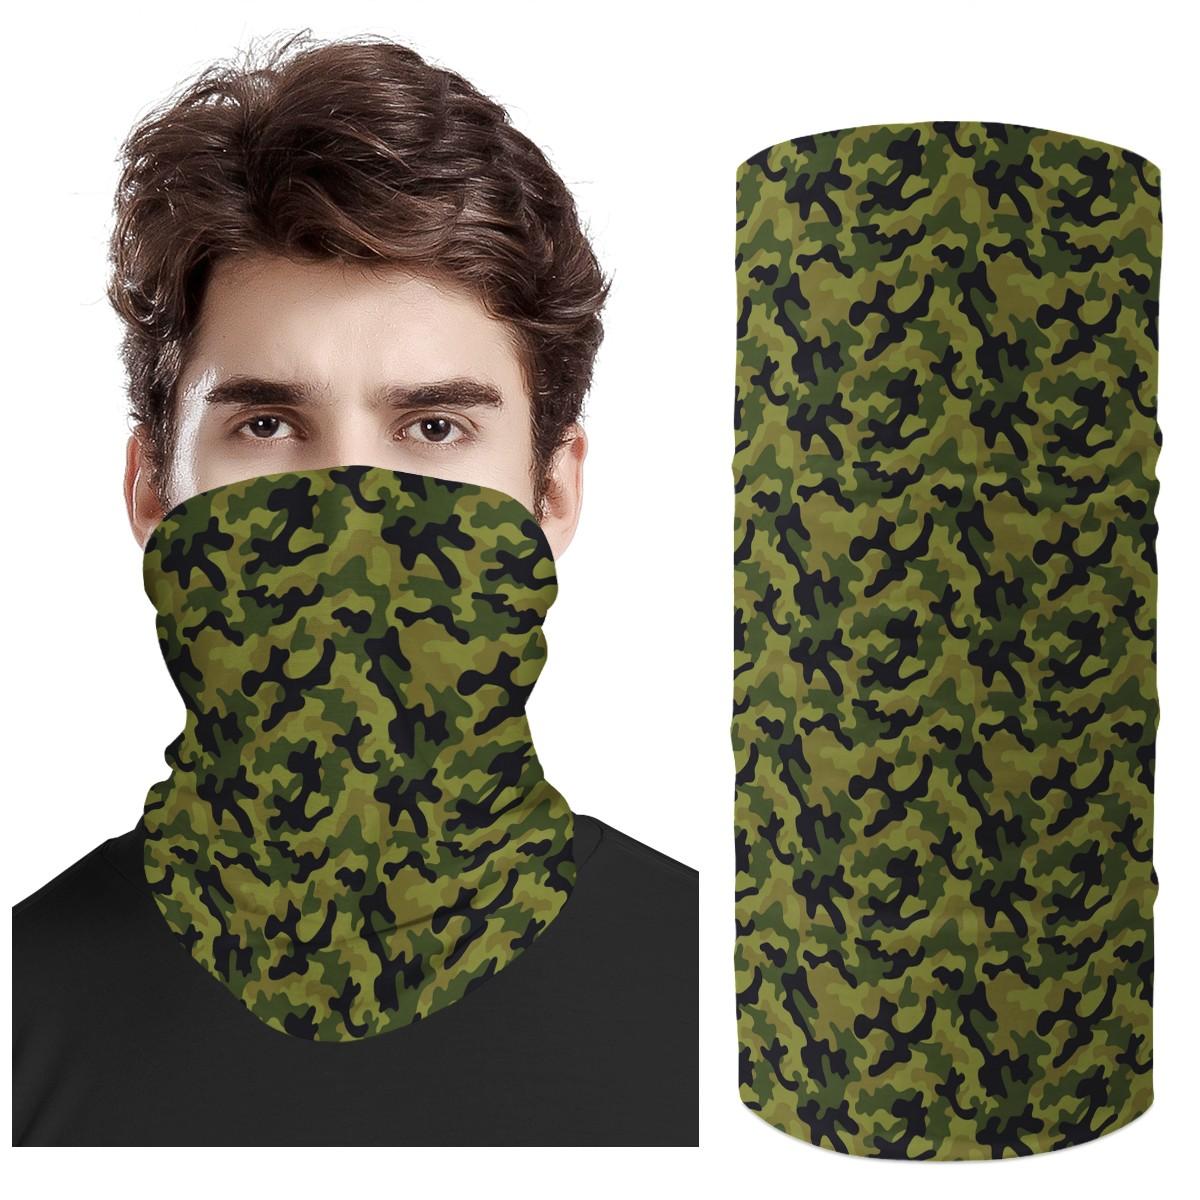 New Arrive Fashion Custom Design Camouflage Camo 3D Print Fashion Scarf Customer Drop Shipping Whole